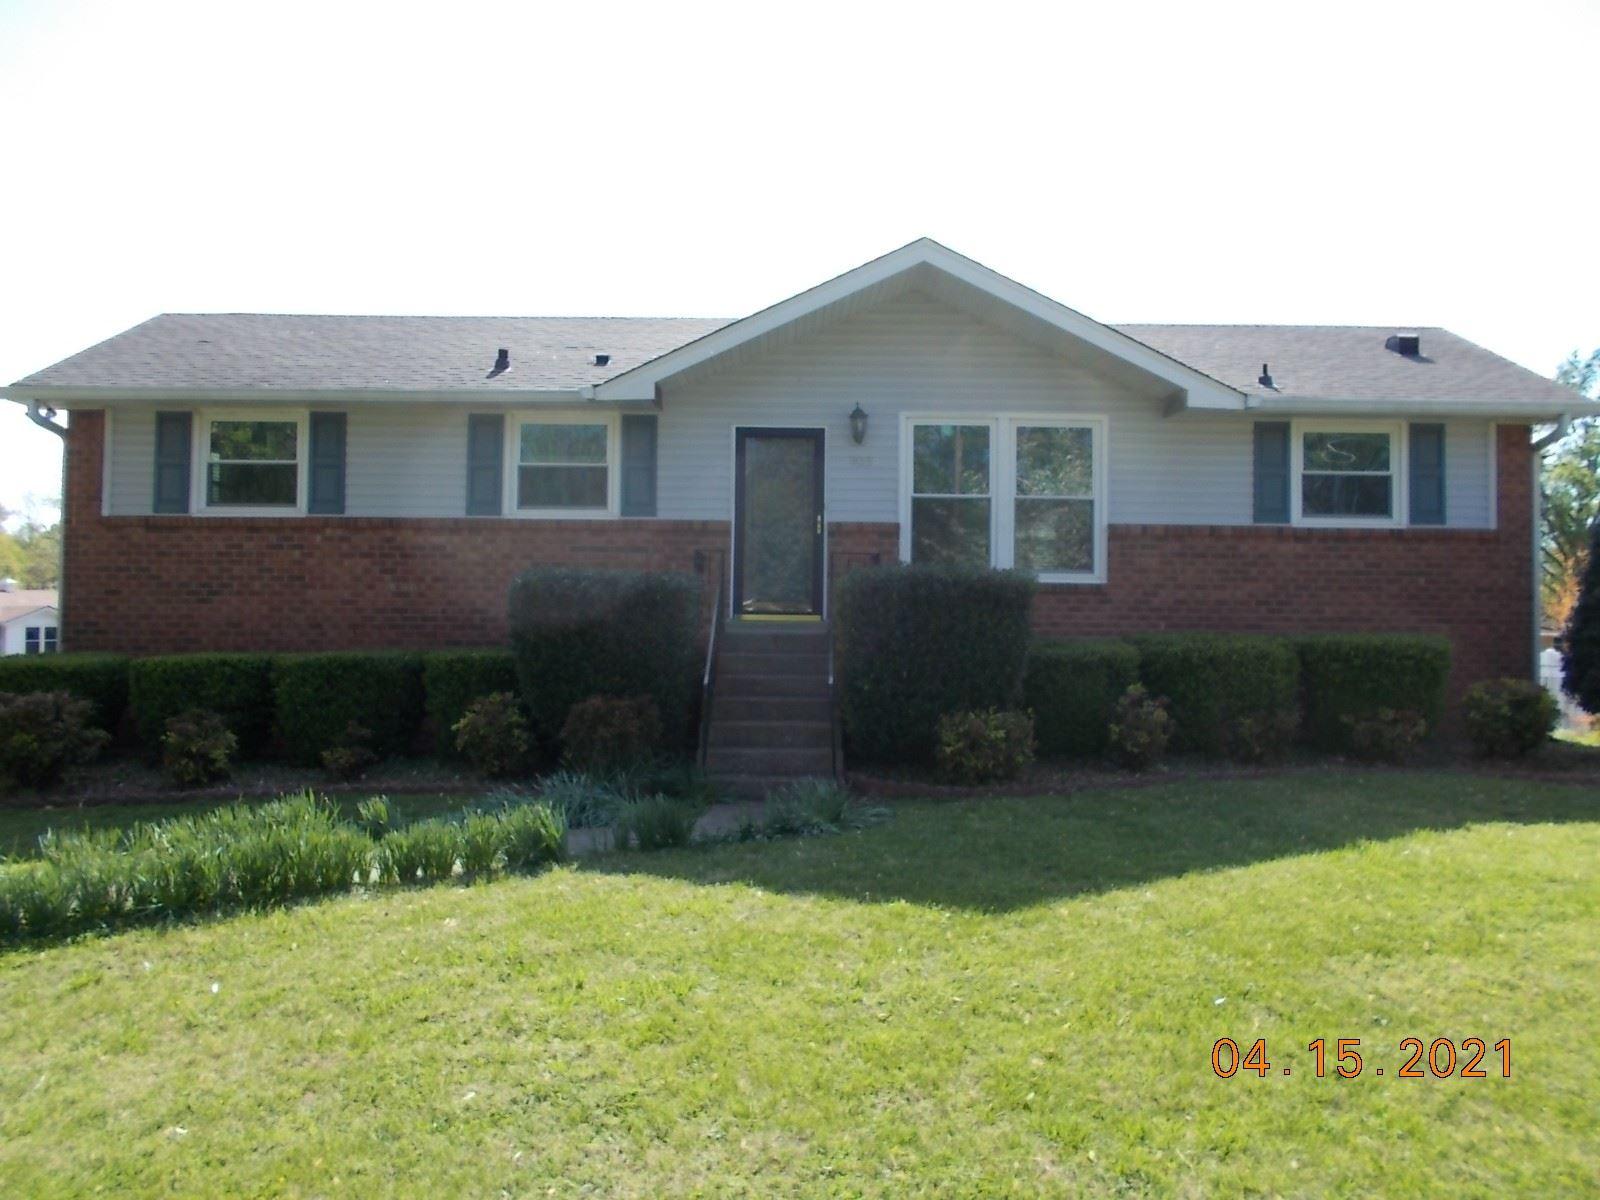 303 Crestridge Dr, Old Hickory, TN 37138 - MLS#: 2245001